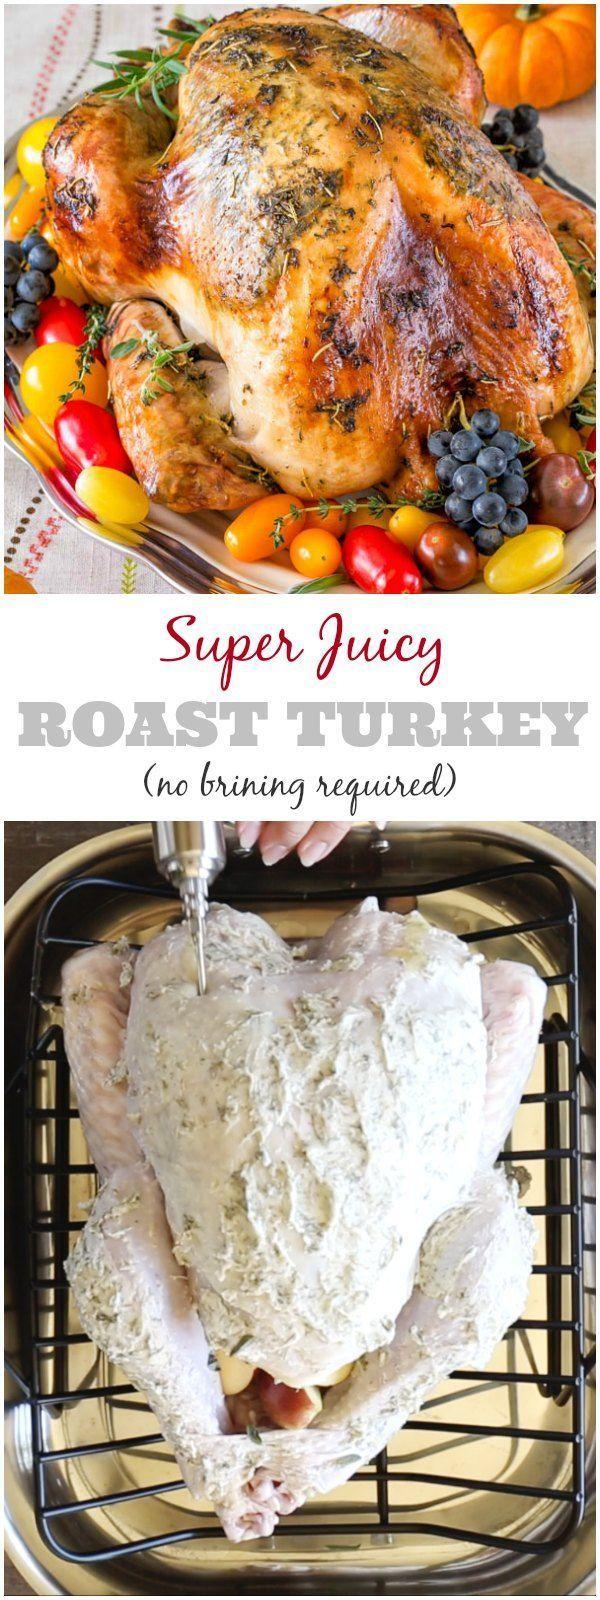 Super Juicy No Brine Roast Turkey + Video #thanksgivingrecipes